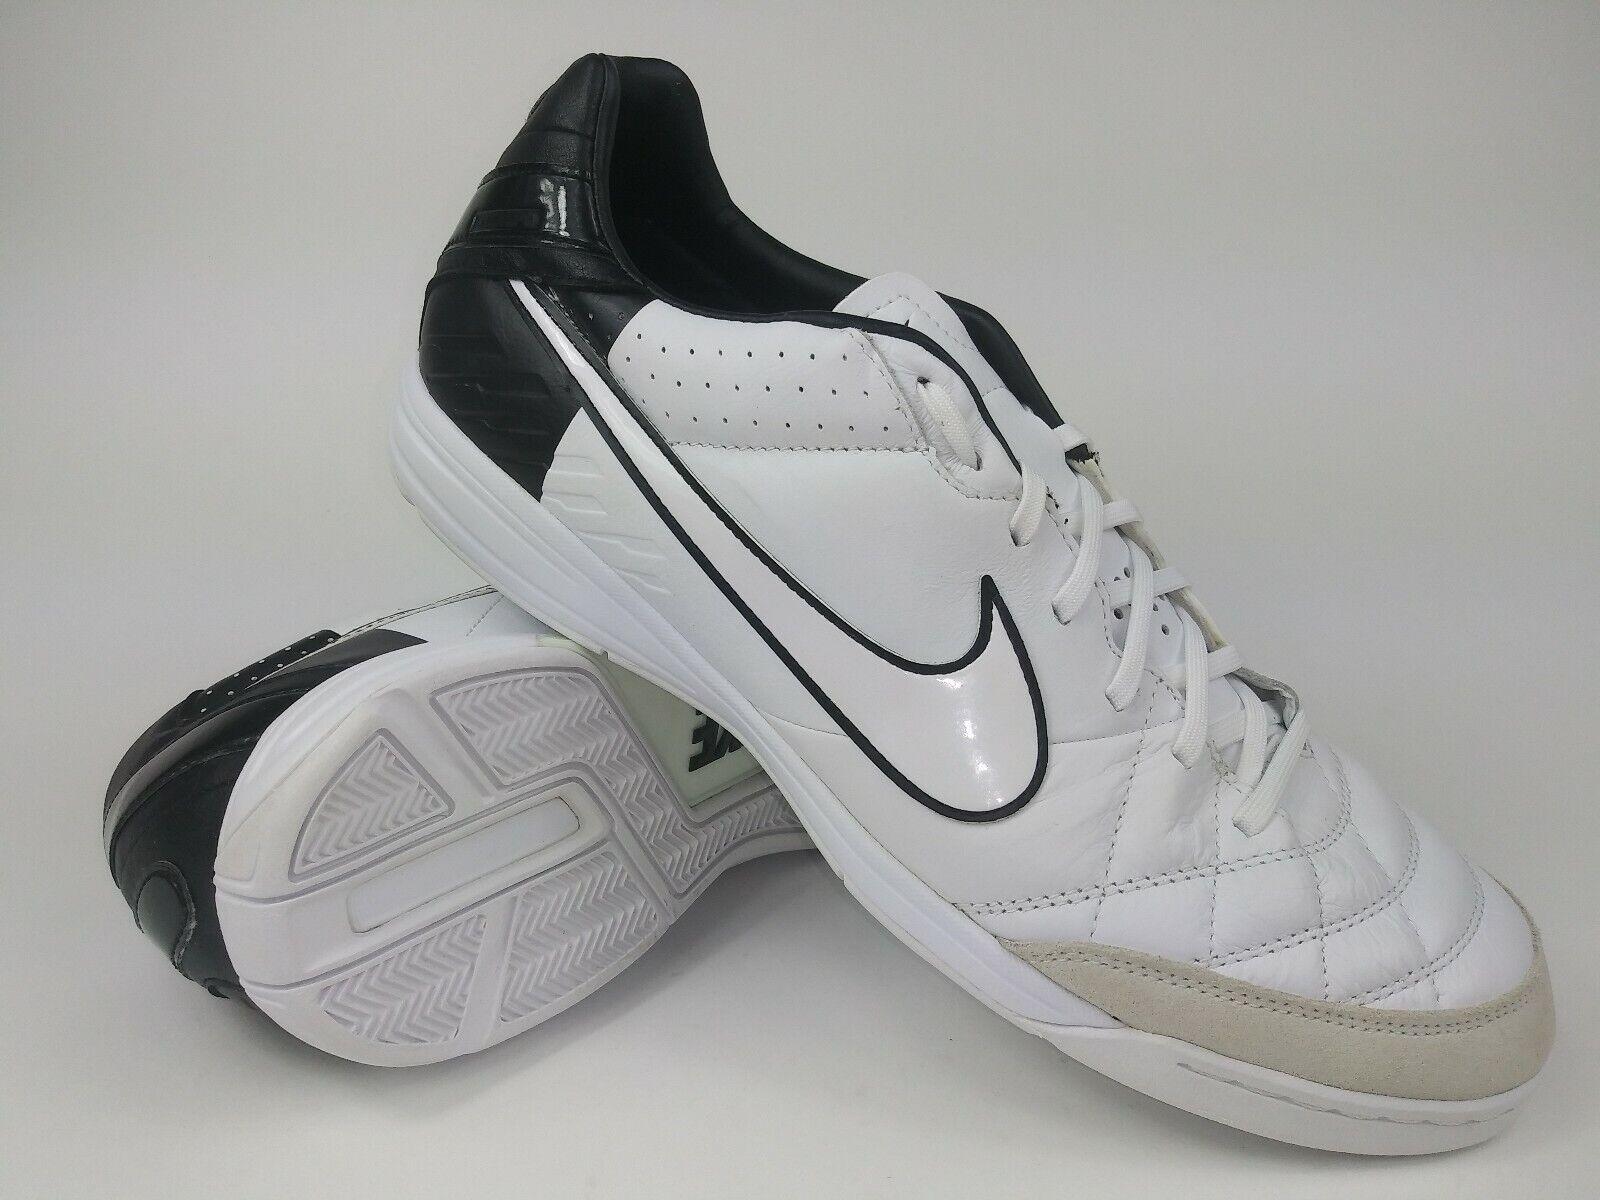 Nike Hombre Raro Tiempo Mystic IV IC 454333-105 blancoo Negro Fútbol Zapatos Talla 12